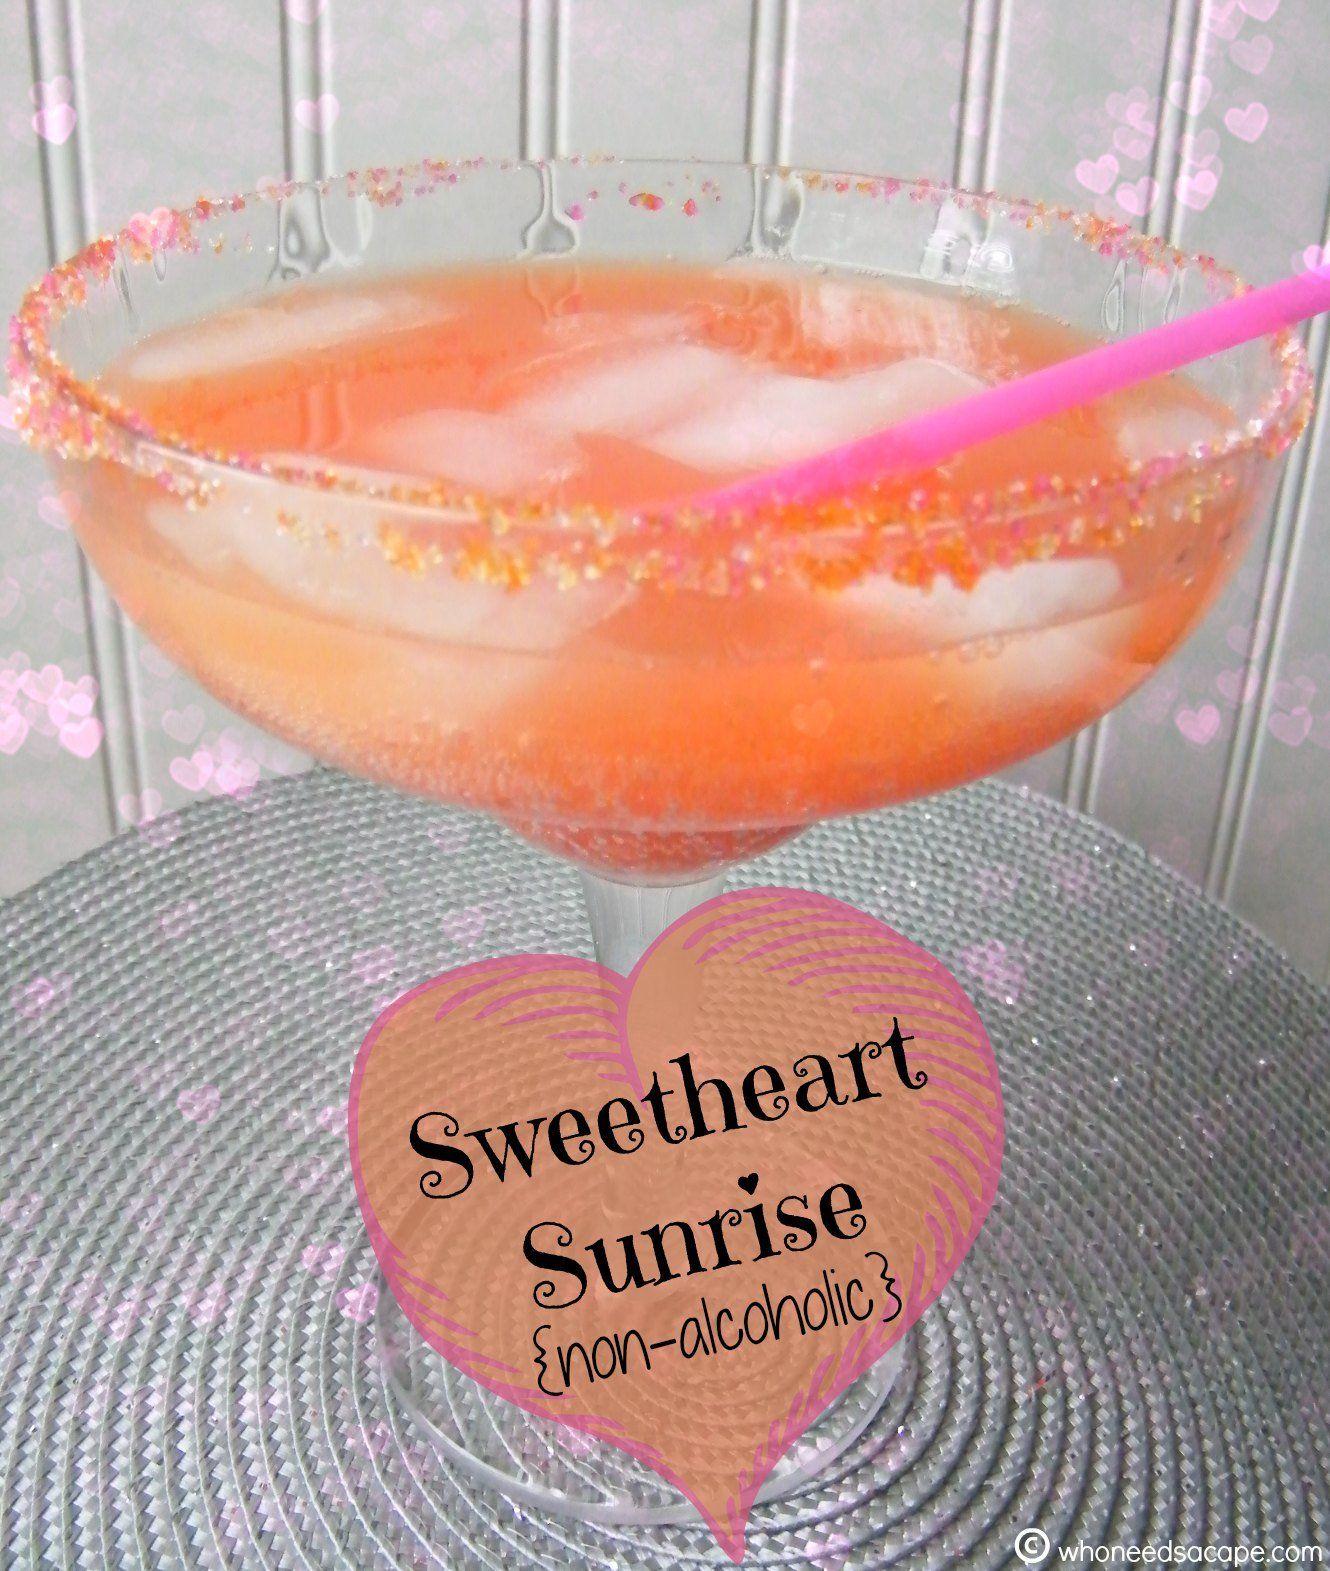 Sweetheart Sunrise (non-alcoholic)